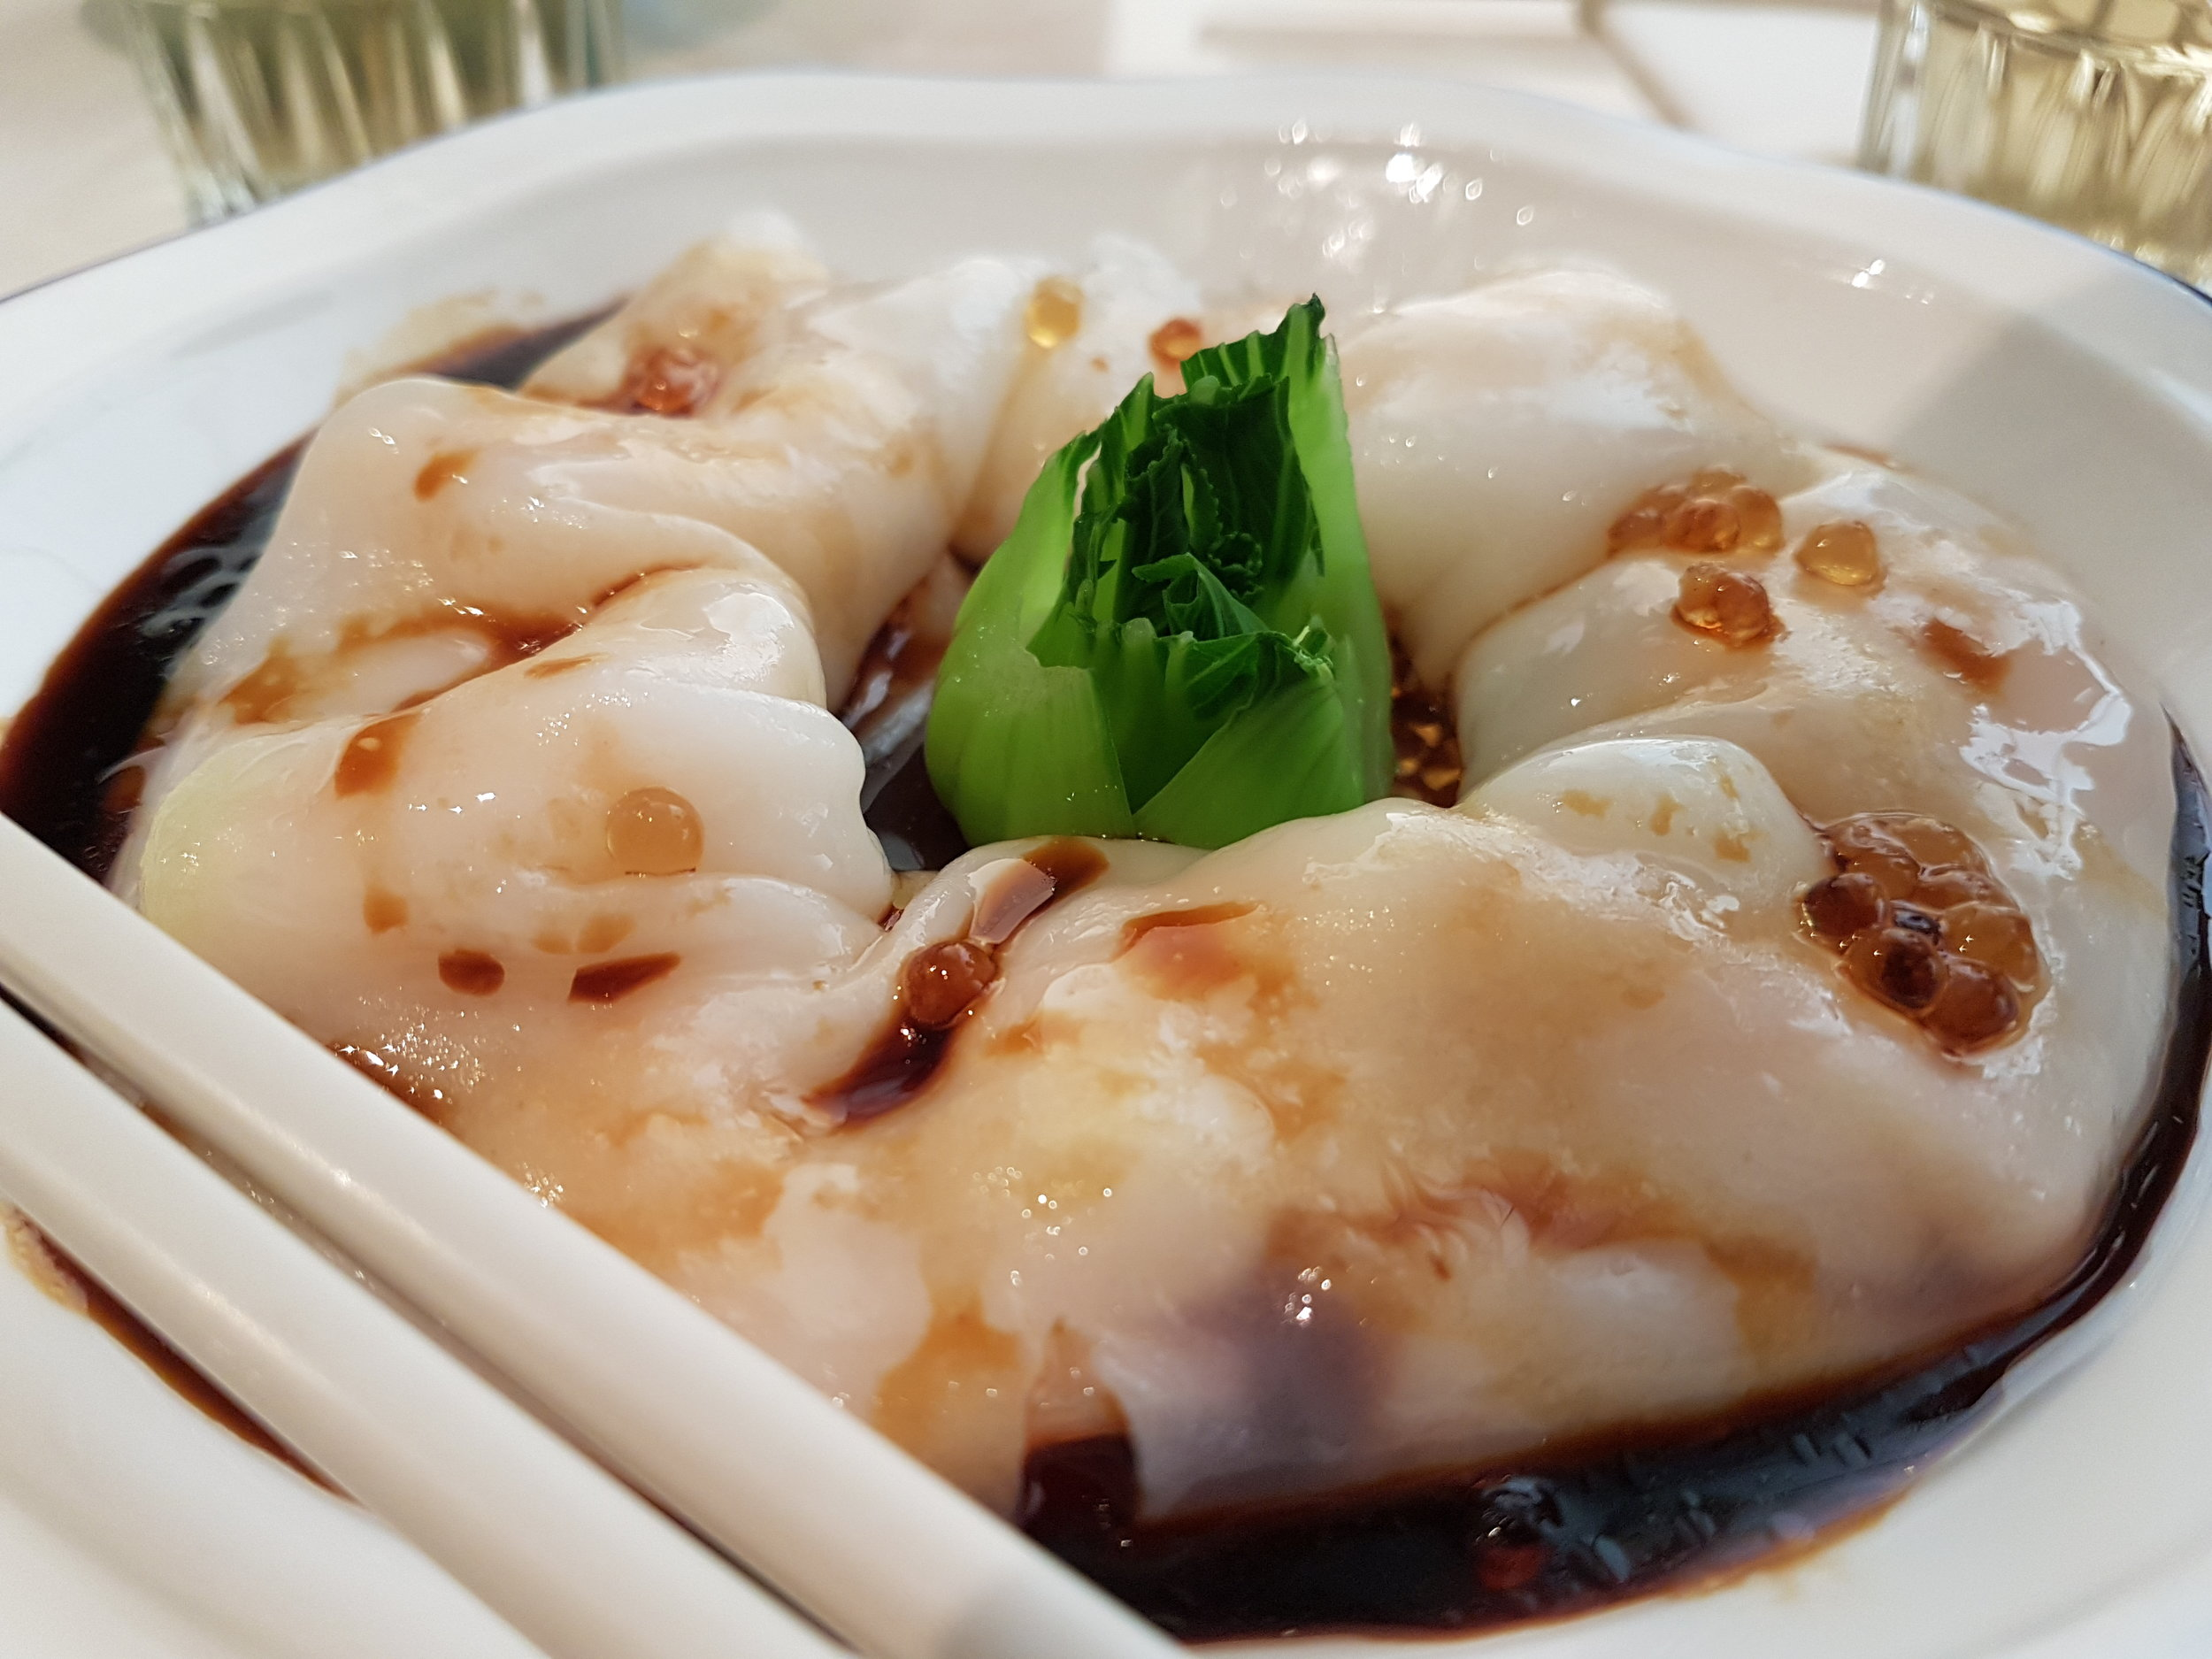 Shrimp dim sum @ Yum Cha